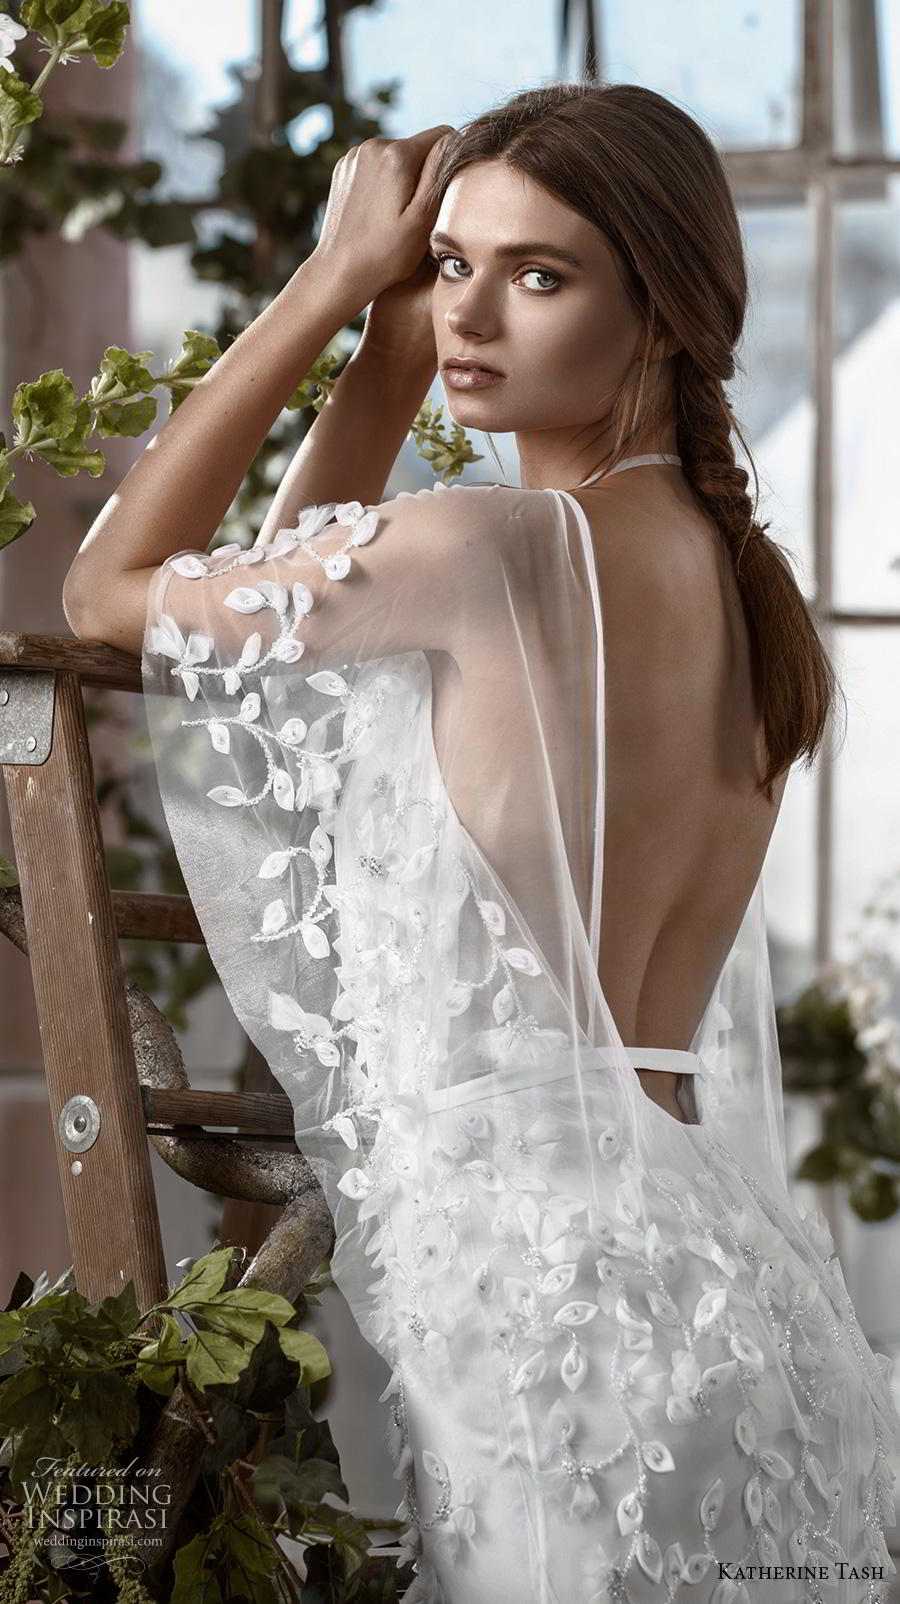 katherine tash fall 2019 bridal half kimino sleeves deep v neck heavily embellished bodice sexy fit and flare wedding dress backless sweep train (1) zbv